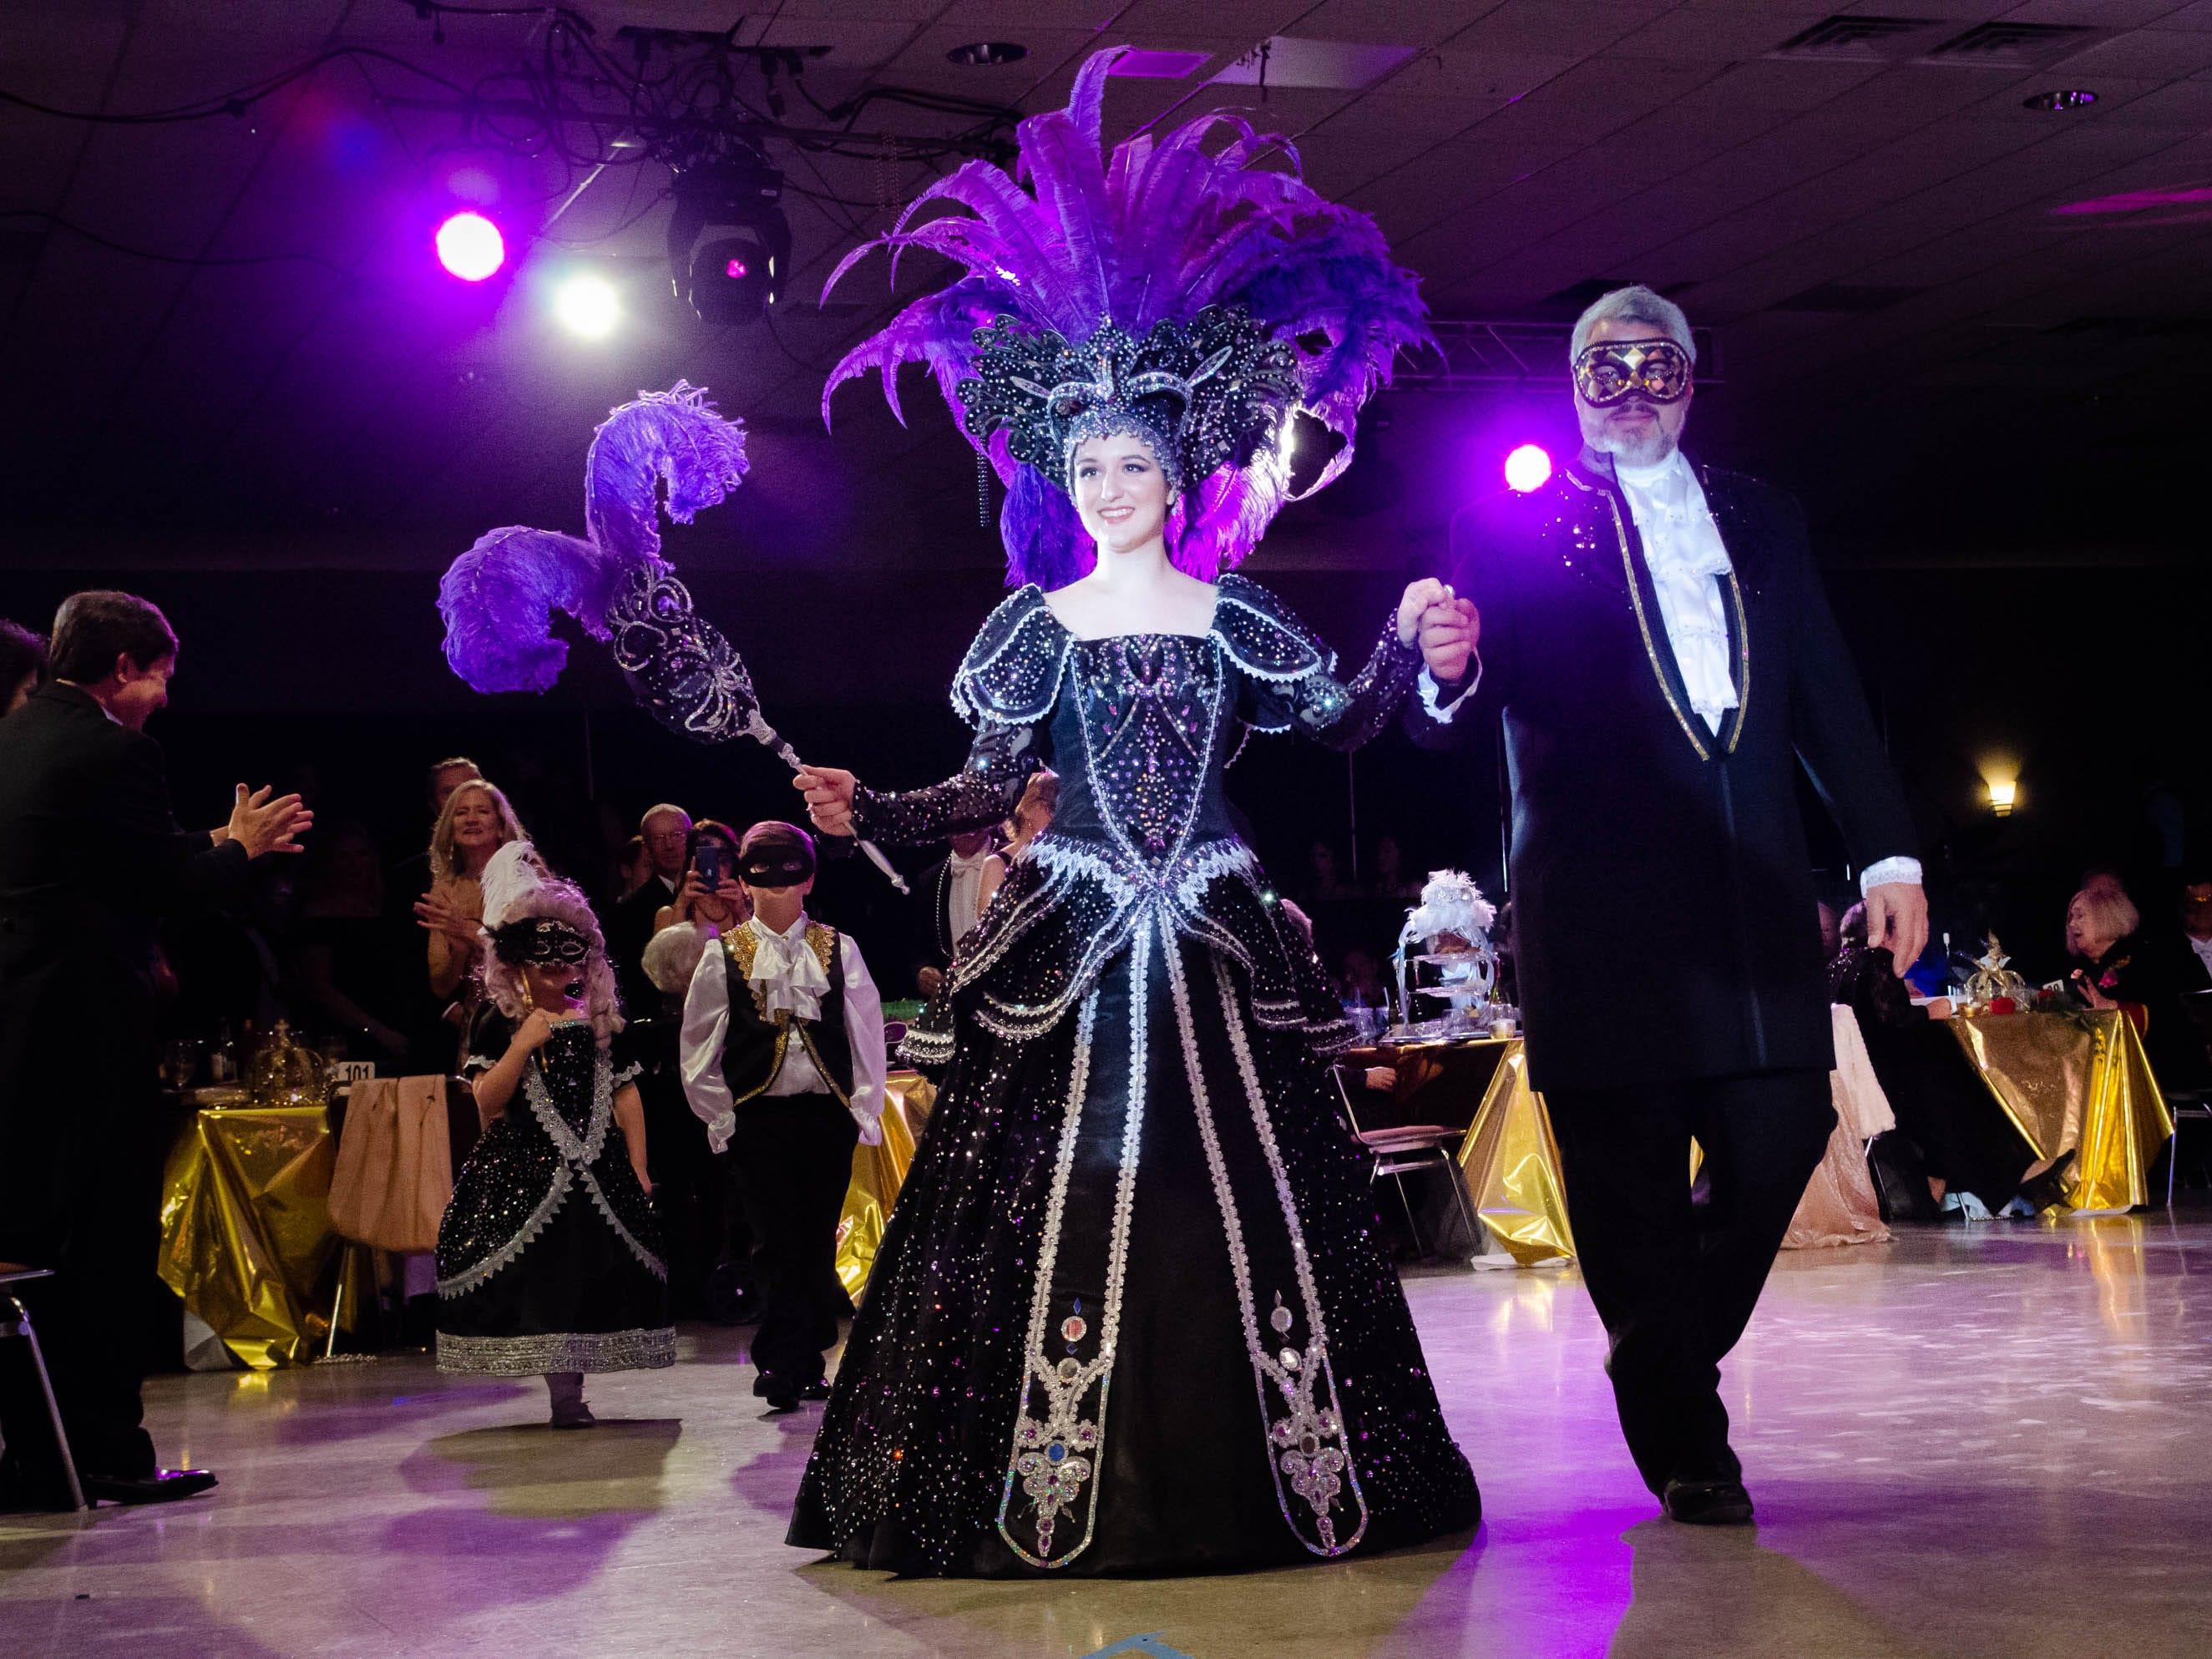 77th Annual Krew de Troubadours Mardi Gras Ball. Natalie Rose of the House of Piccione (Black Swan) along side Royal Duke James Kirk Piccione.